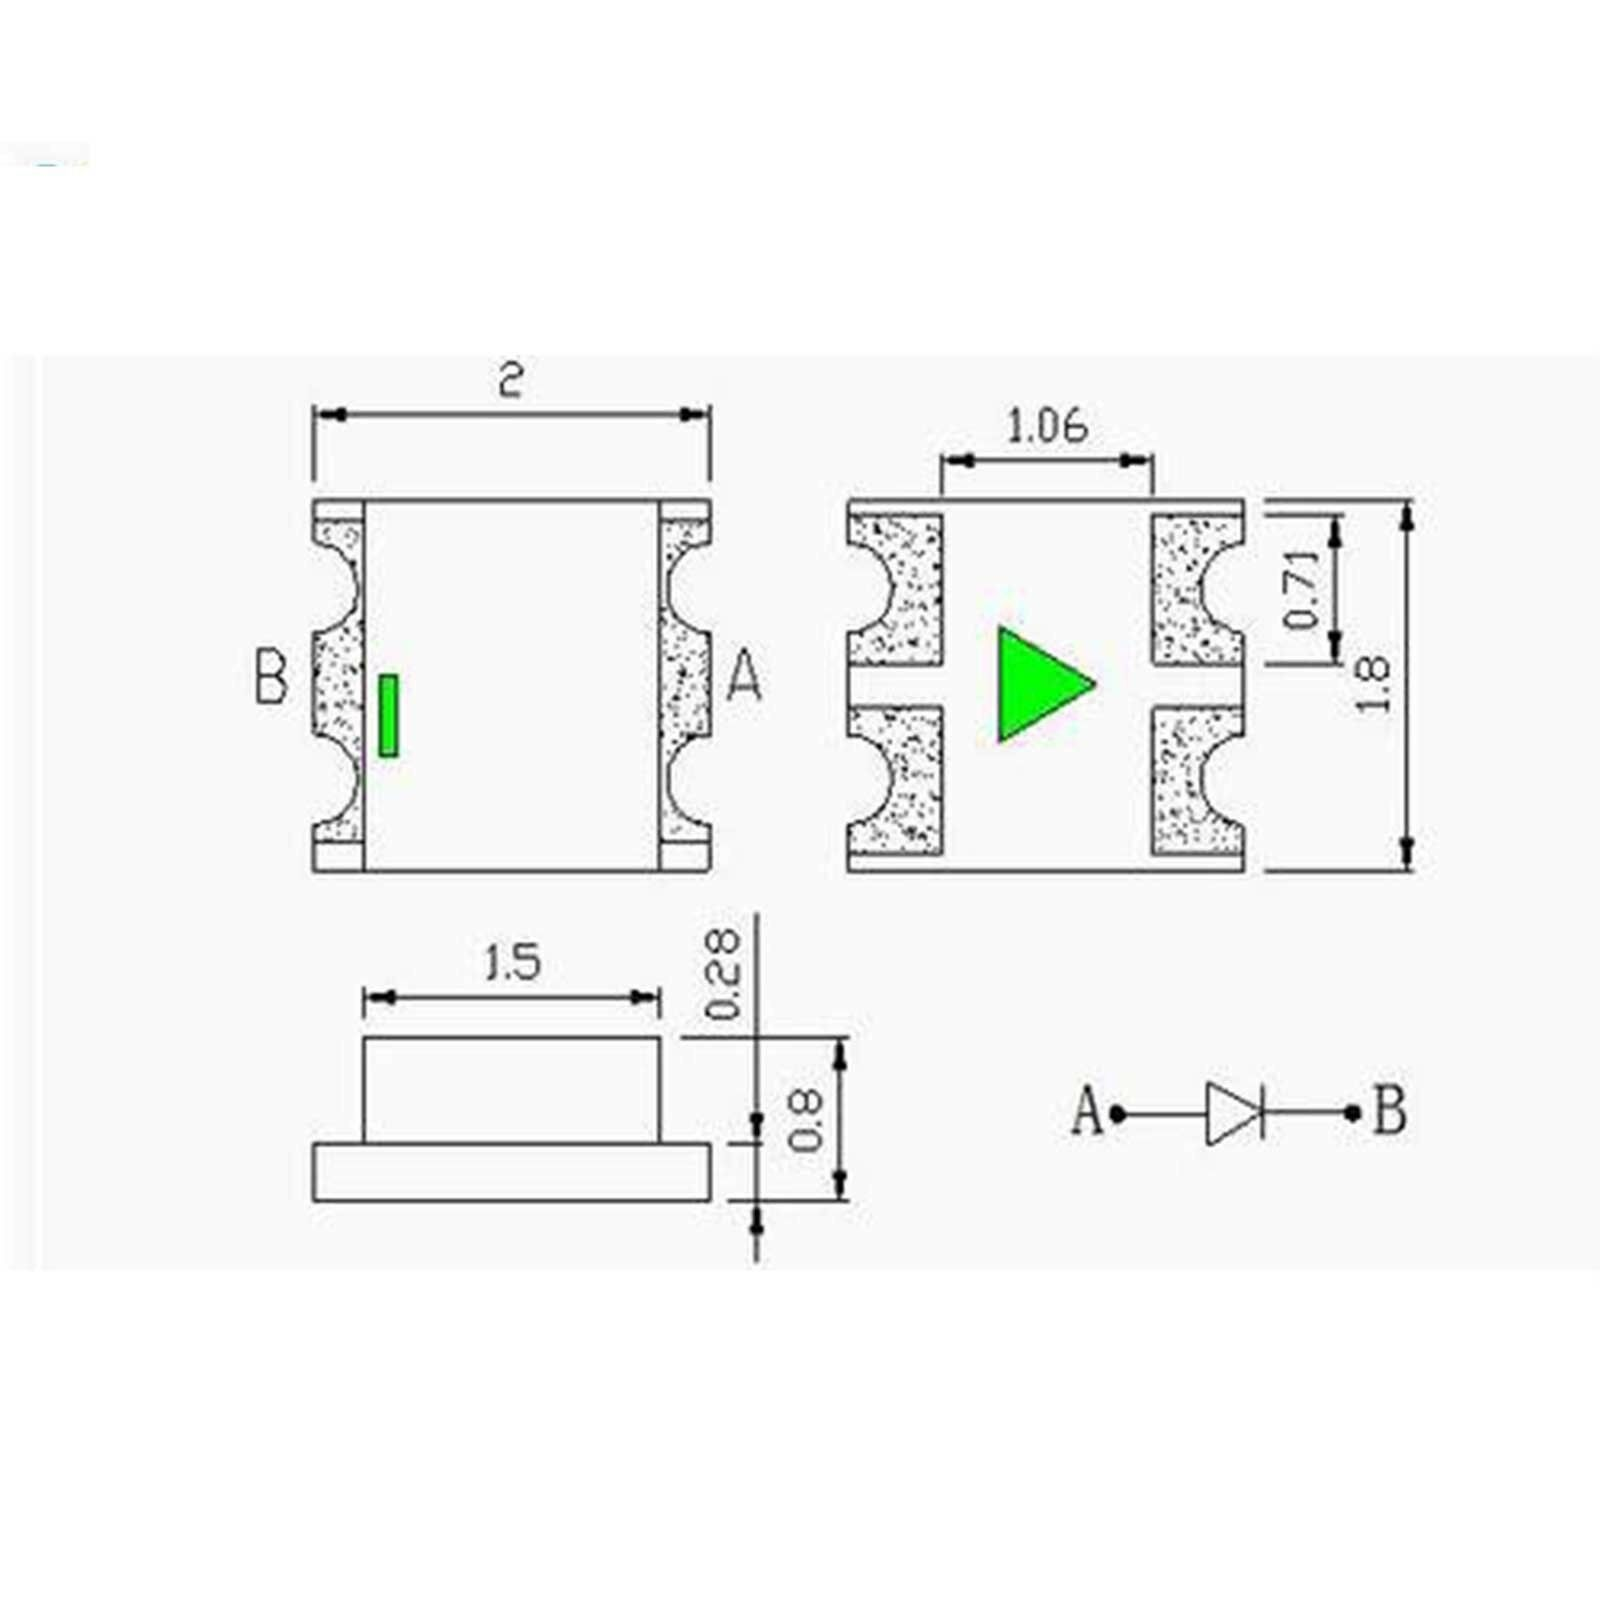 50 x 12v 0807 0805 Blue Micro Flashing SMD Pre-Wired LED Light Blinking 9v 18v